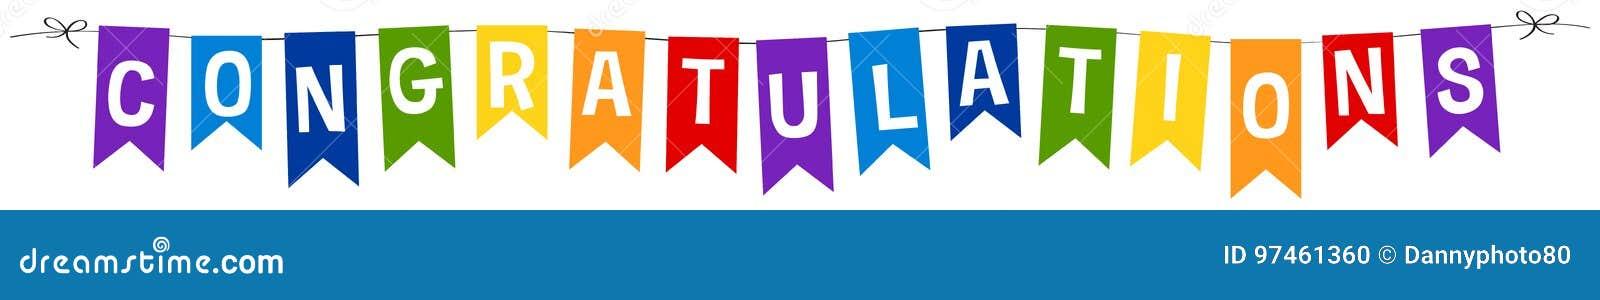 Banner design for congratulations